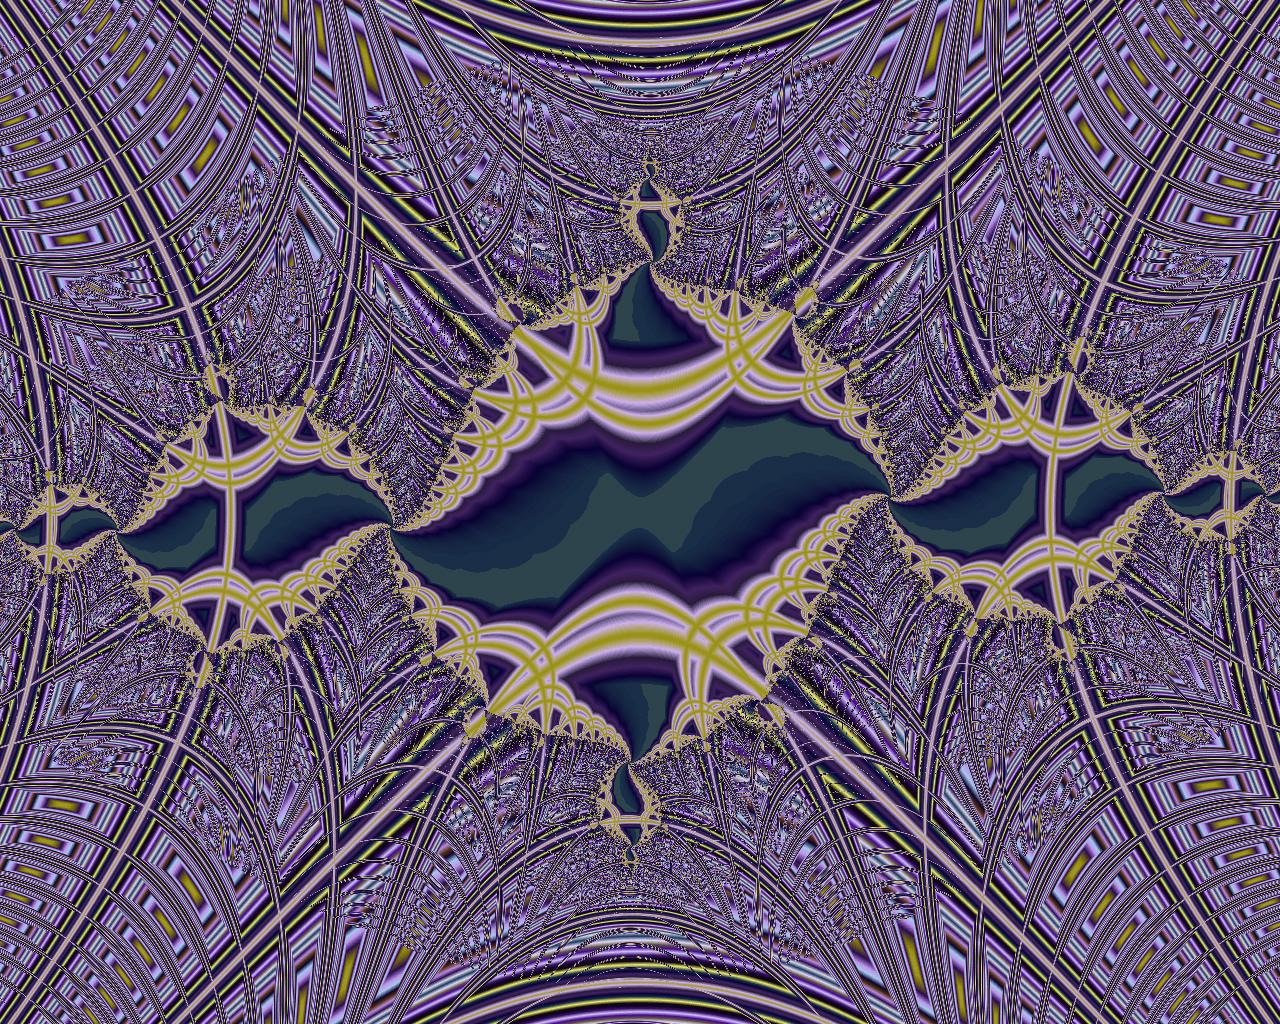 Strange Attractor Wallpaper Download Strange-attractor